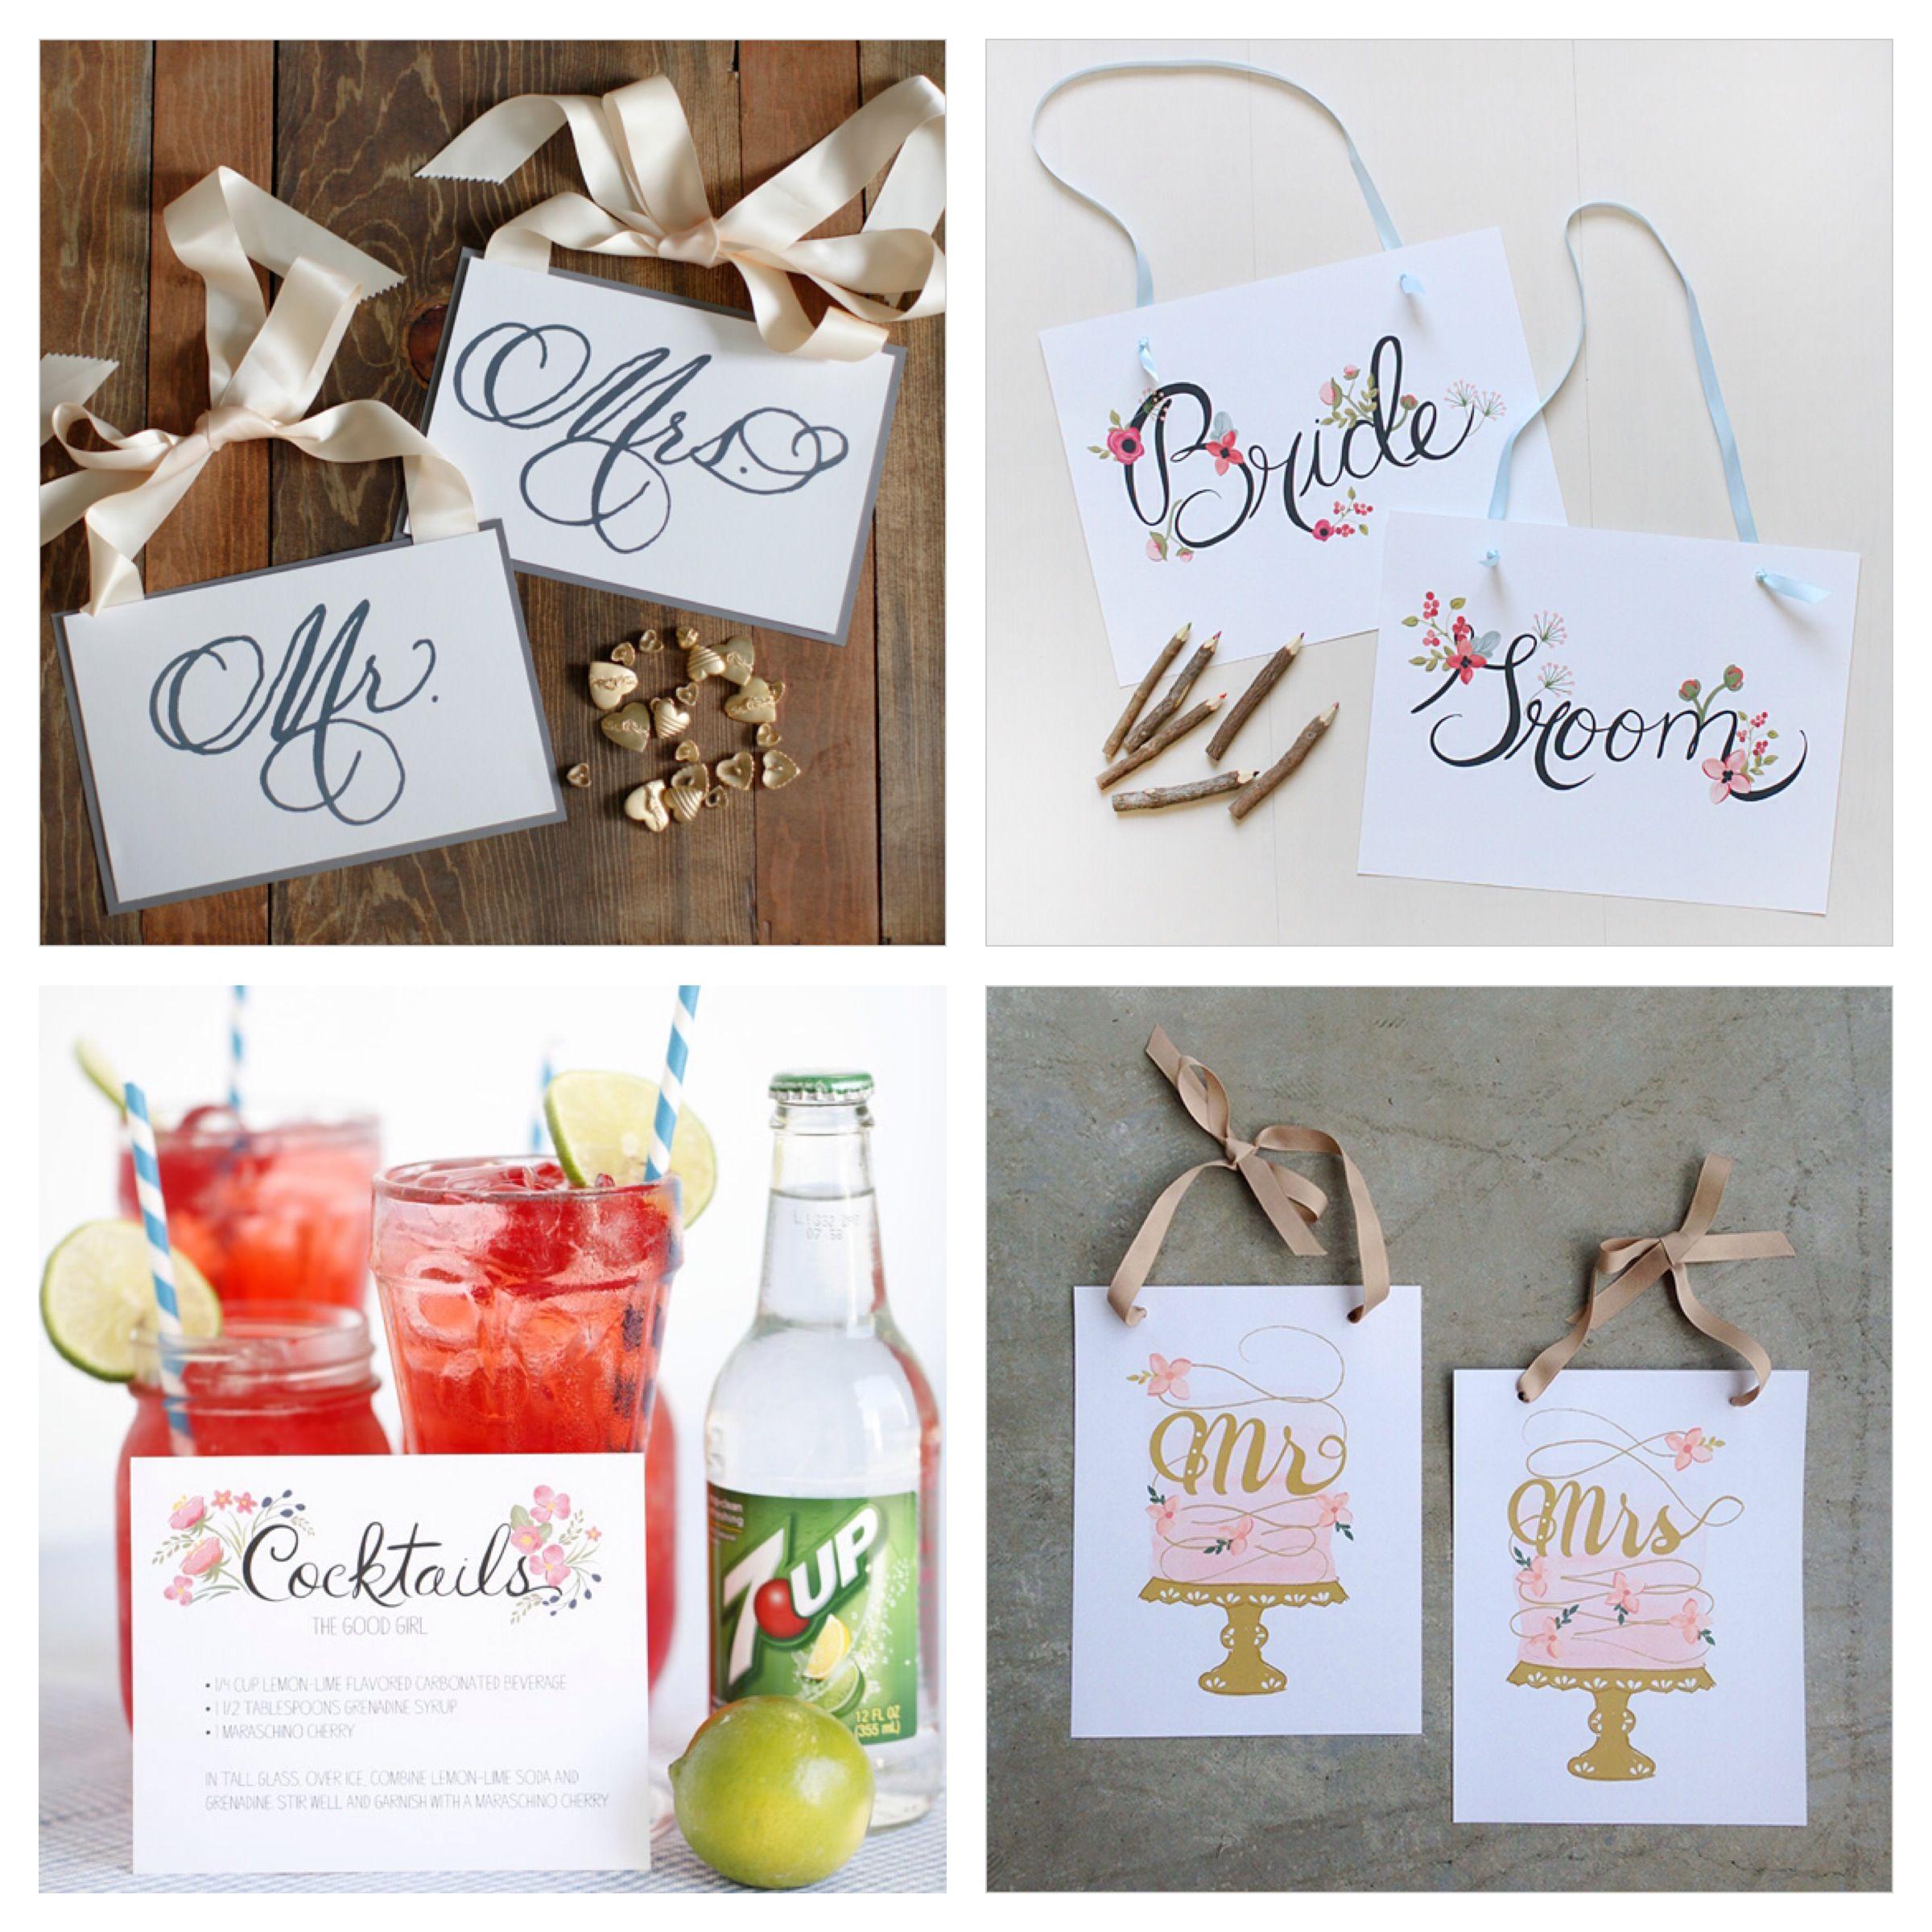 Wedding Chicks Free Invitations: Pin By Wedding Chicks On Freebies & Free Printables